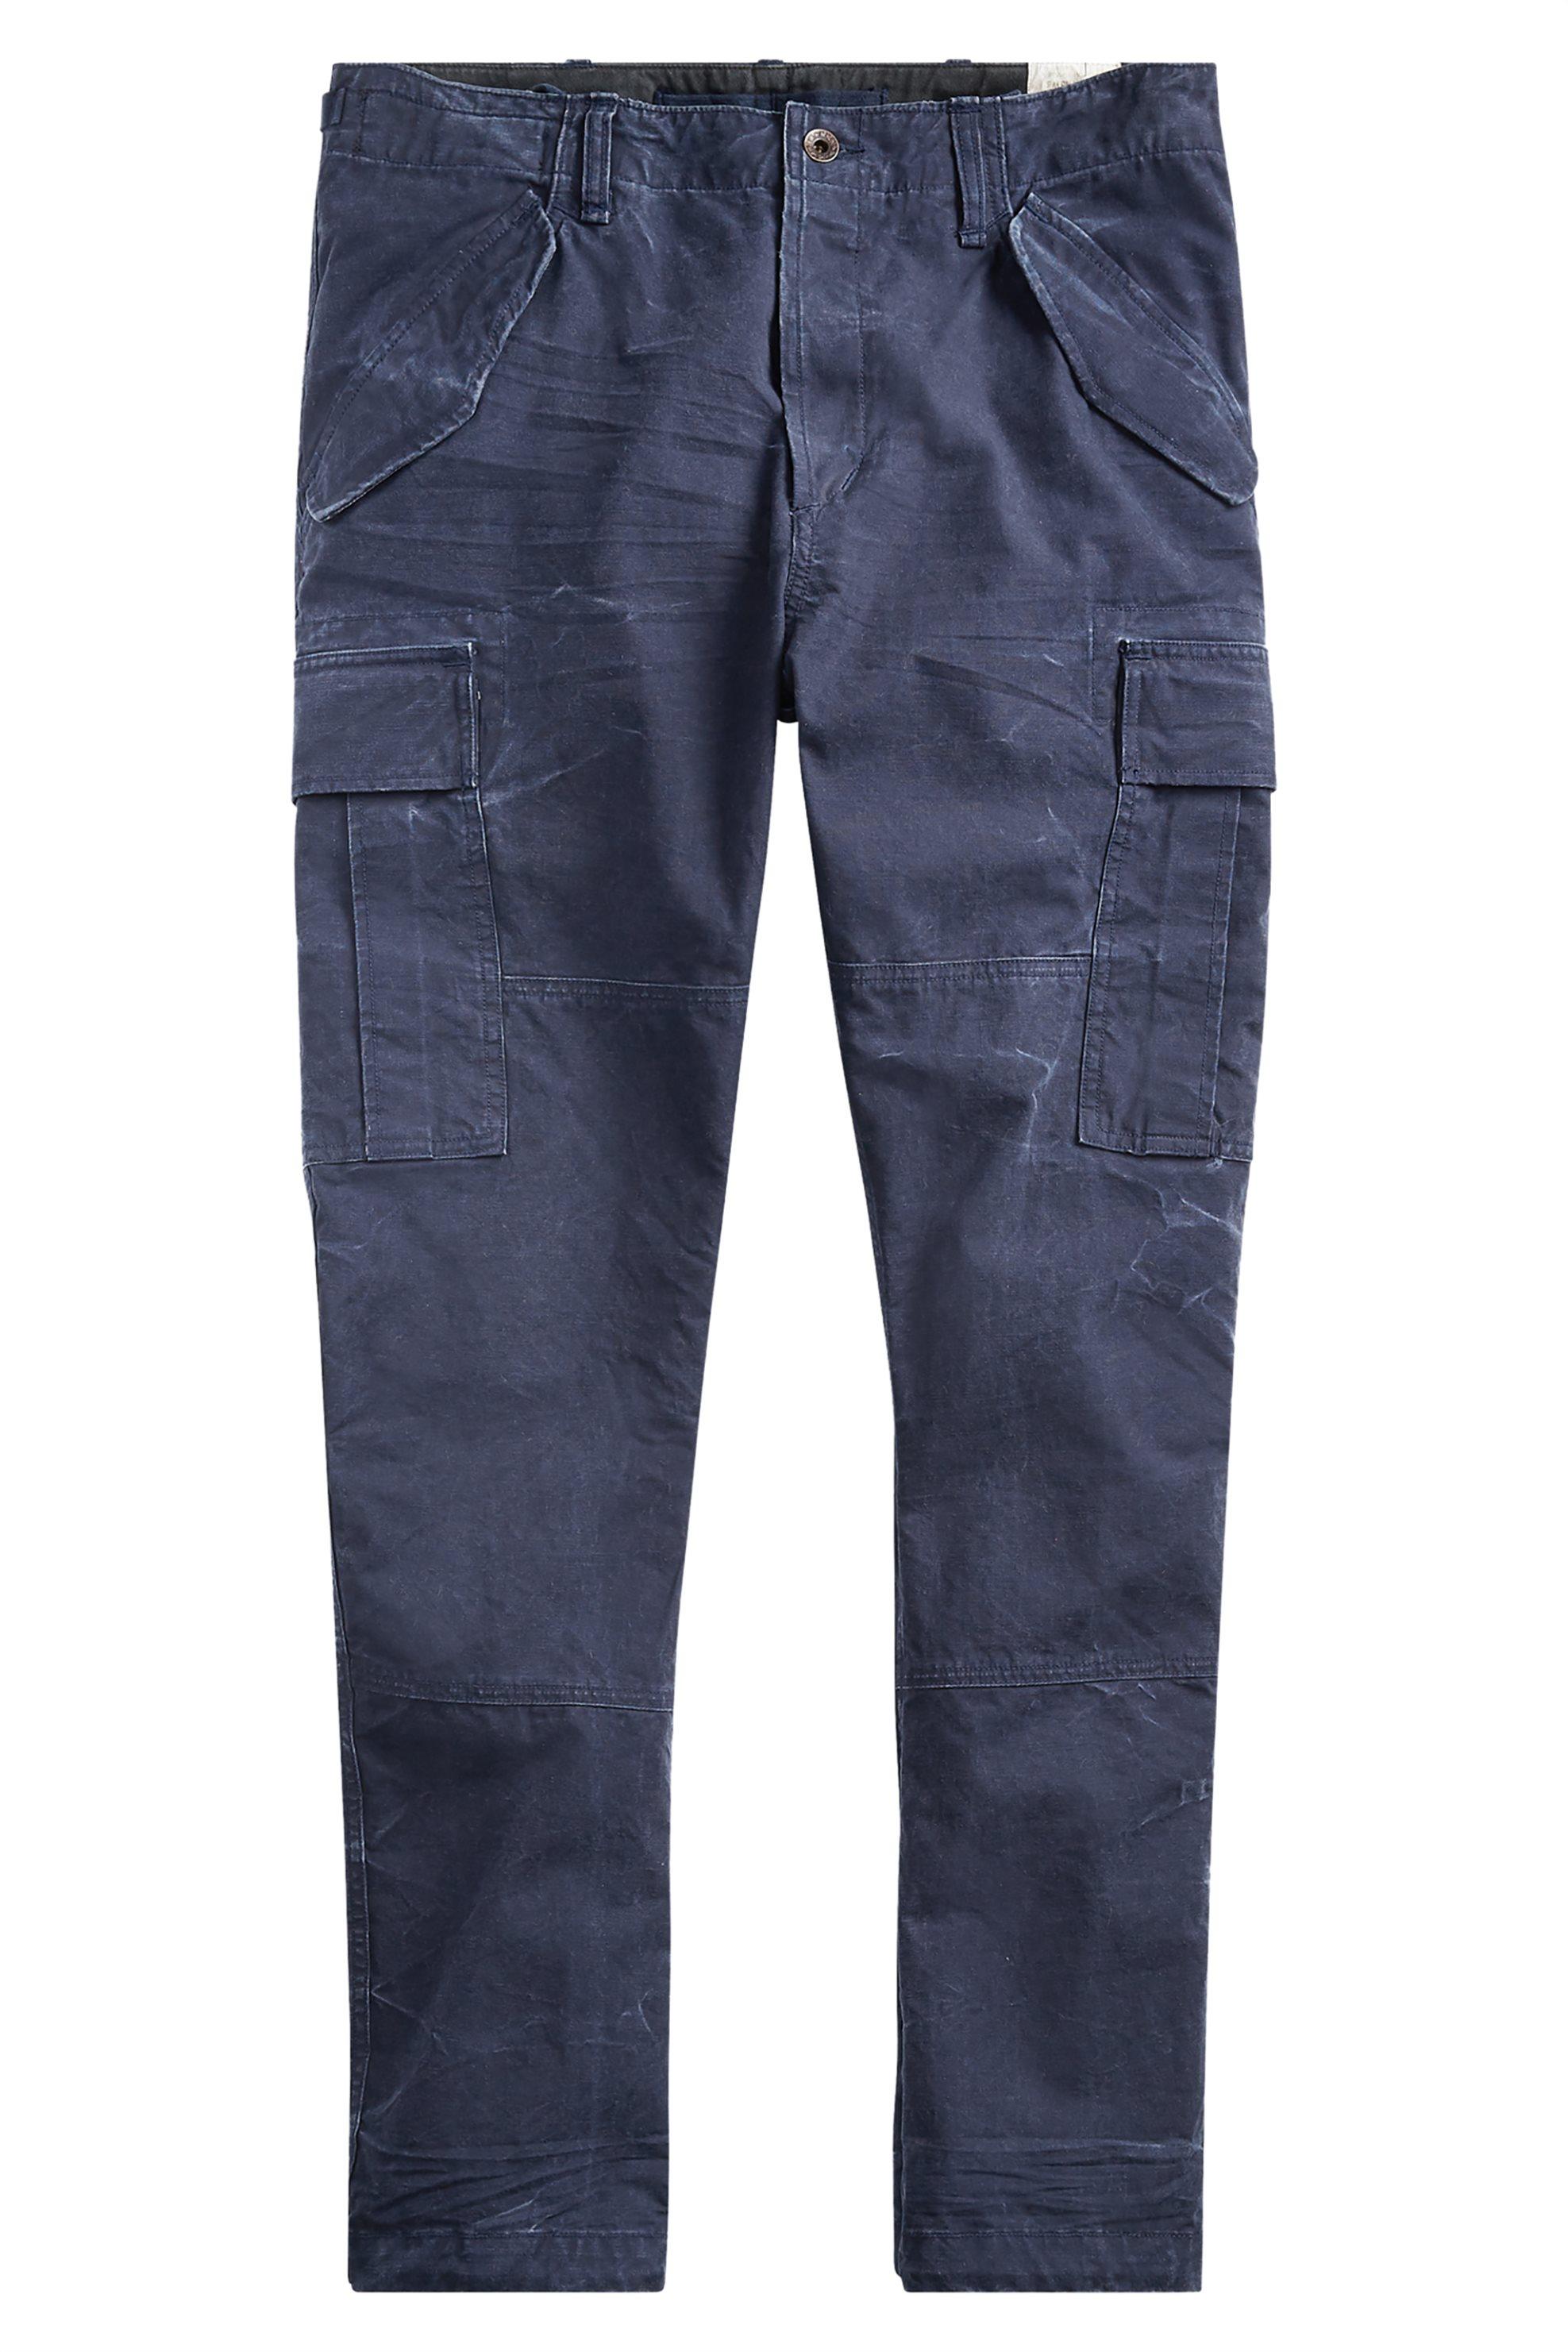 Polo Ralph Lauren ανδρικό παντελόνι Slim Fit Canvas Cargo - 710671176003 - Μπλε ανδρασ   ρουχα   παντελόνια   cargo